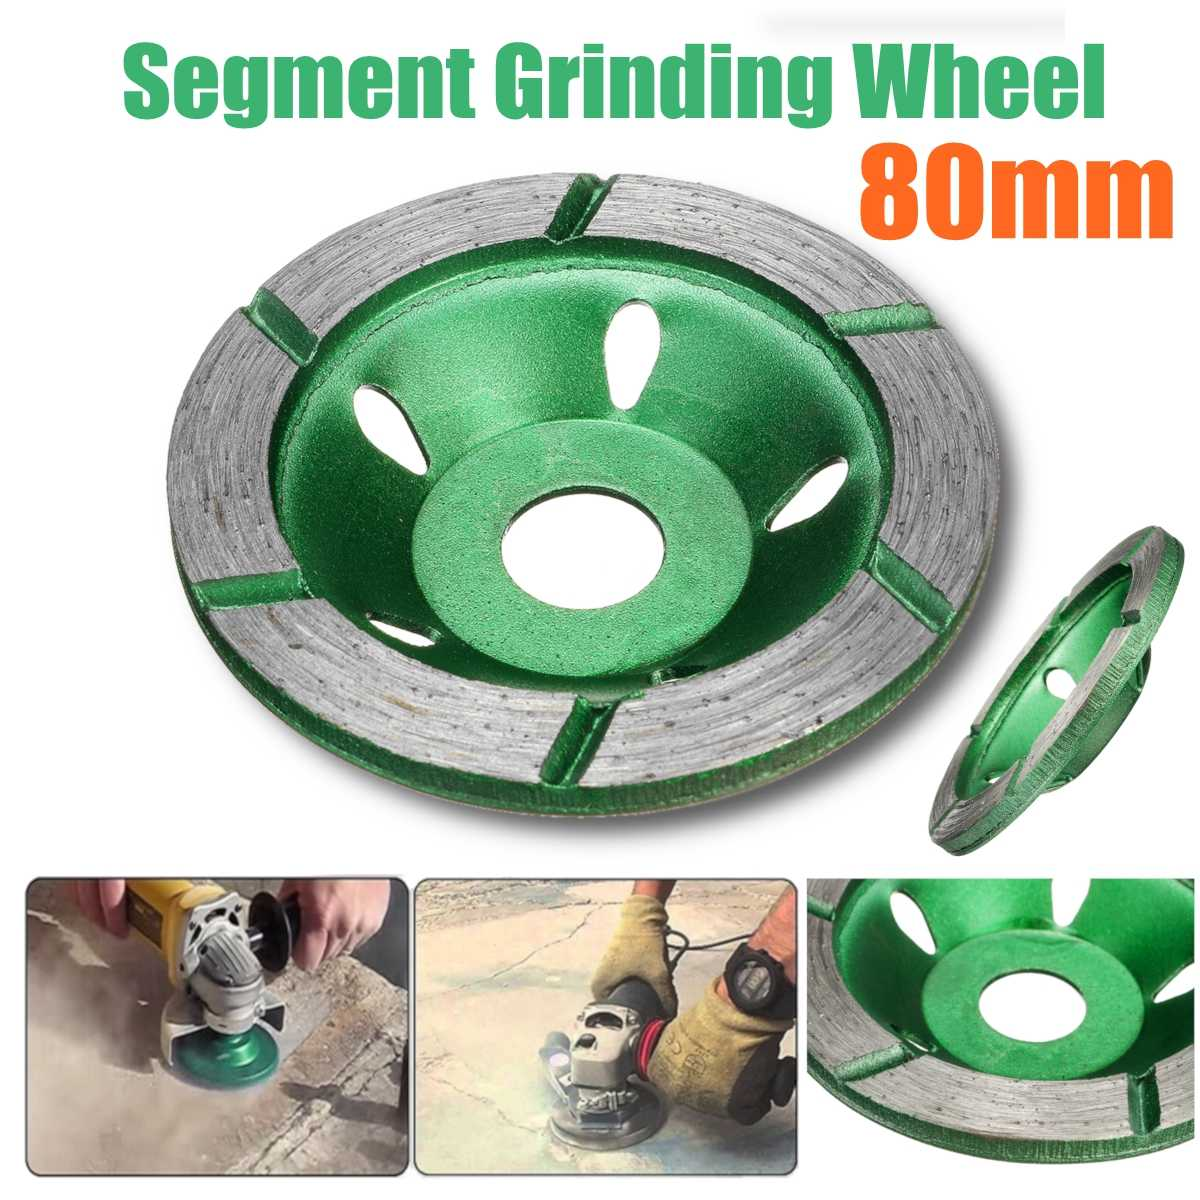 80mm/3.15inch Segment Grinding Wheel Diamond Grinding Disc Grinding Cup Concrete Granite Stone Ceramics Tools